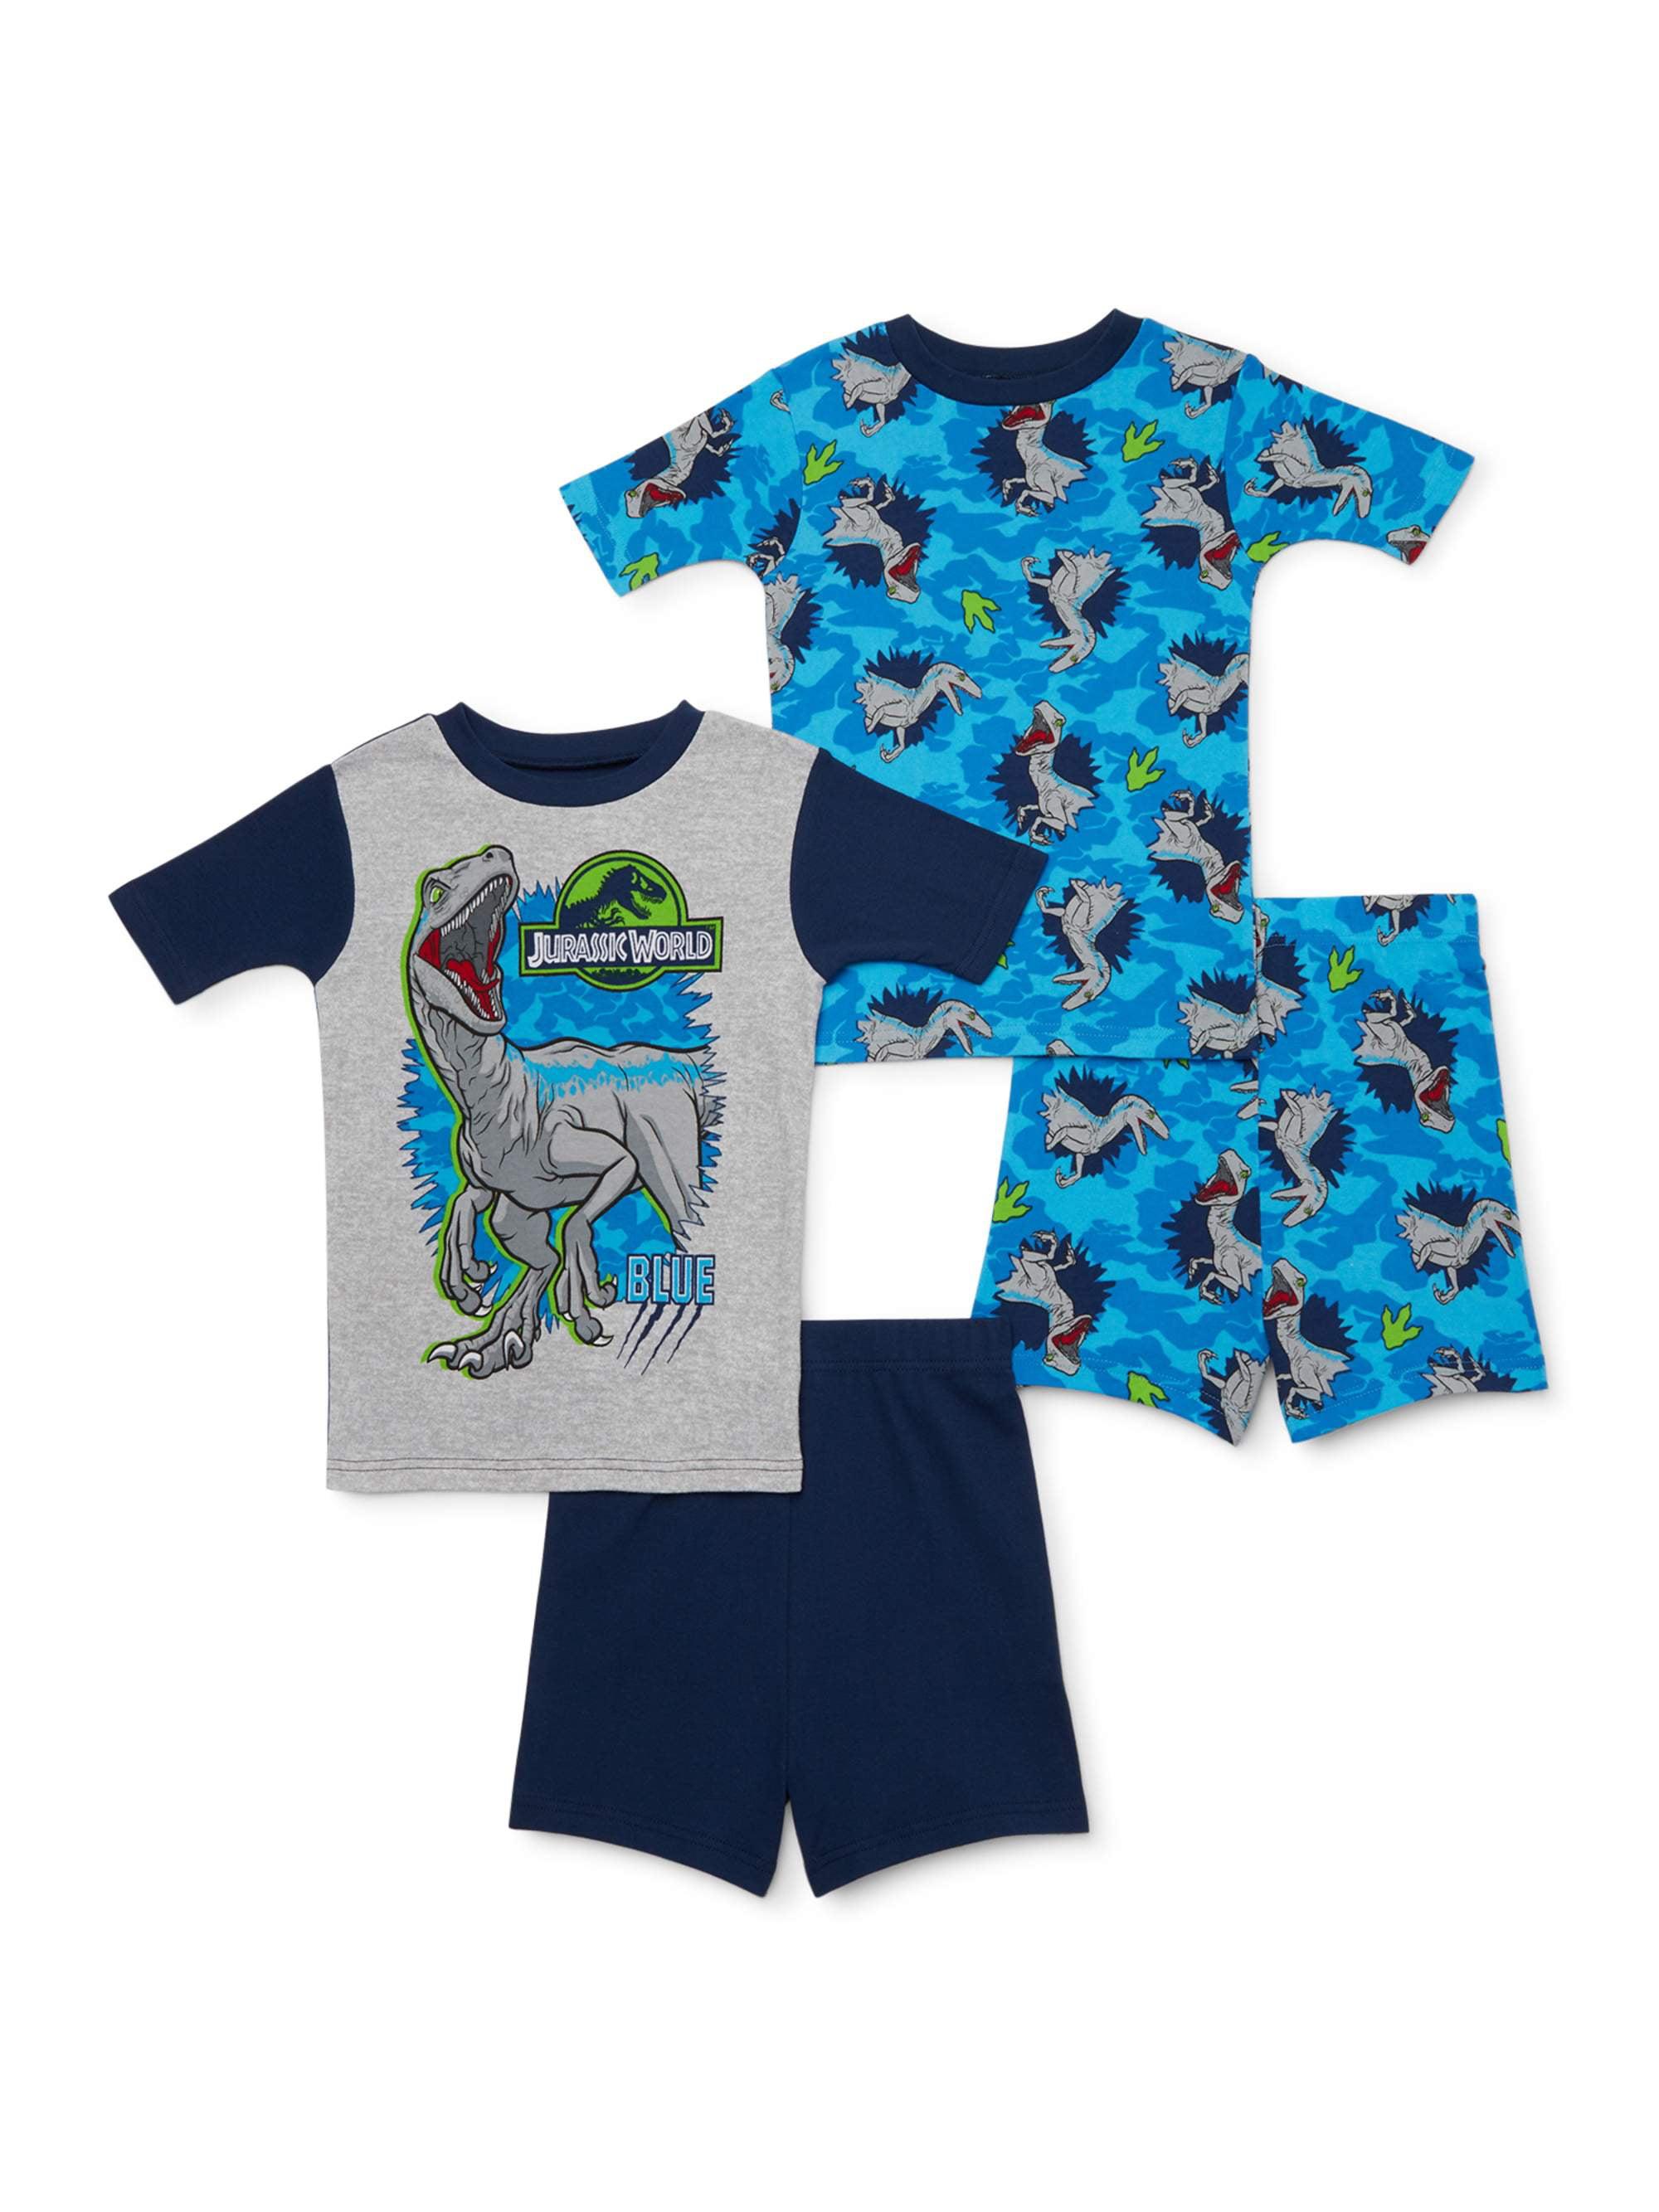 Lego Jurassic World Dinosaur Velociraptor Boys T-Shirt Sz S 6//7 M 8 L 10//12